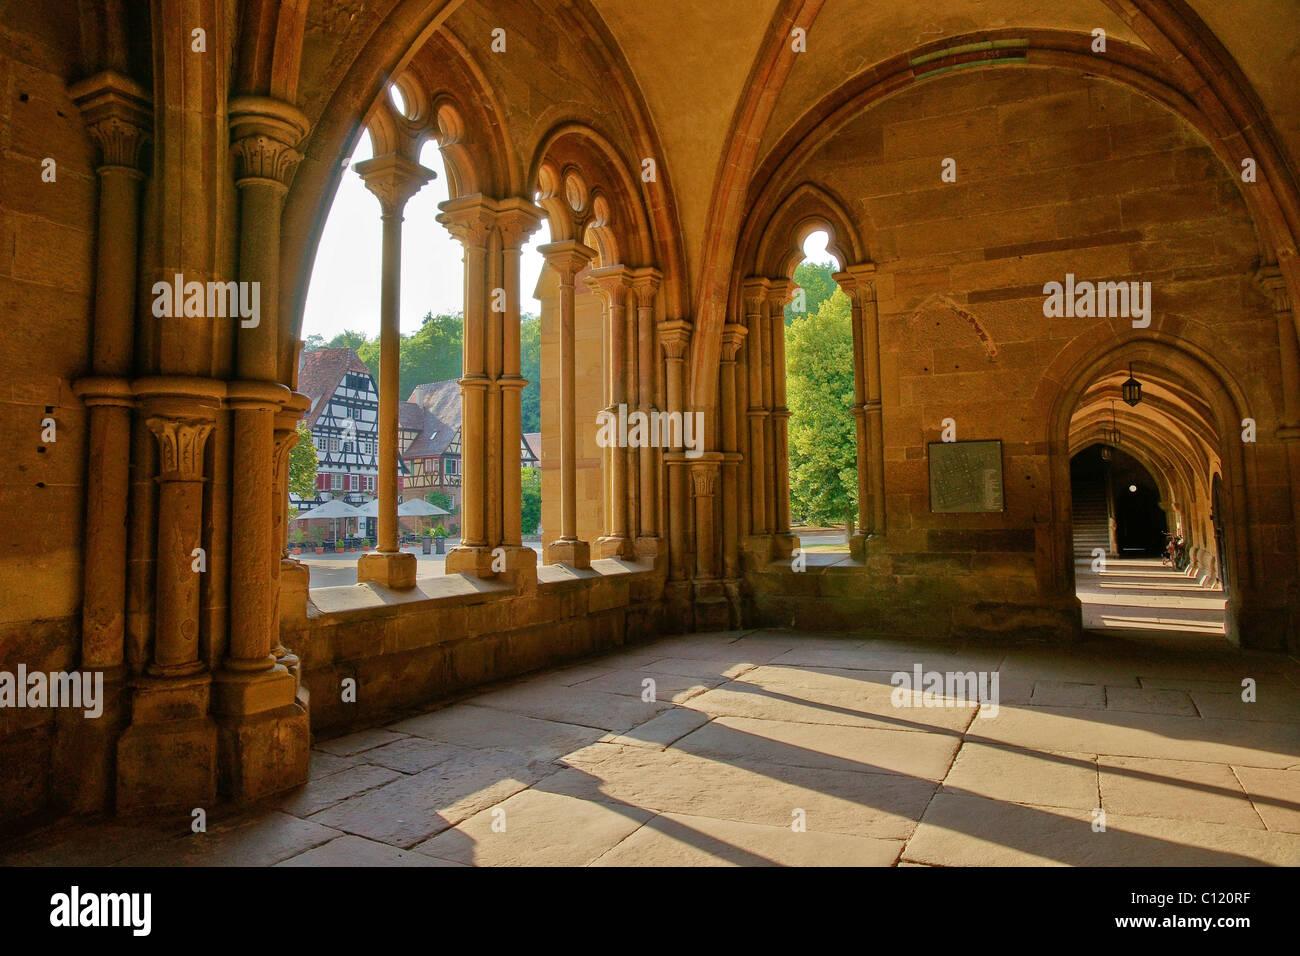 Hall of the Klosterkirche Maulbronn abbey church, Maulbronn, Baden-Wuerttemberg, Germany, Europe - Stock Image